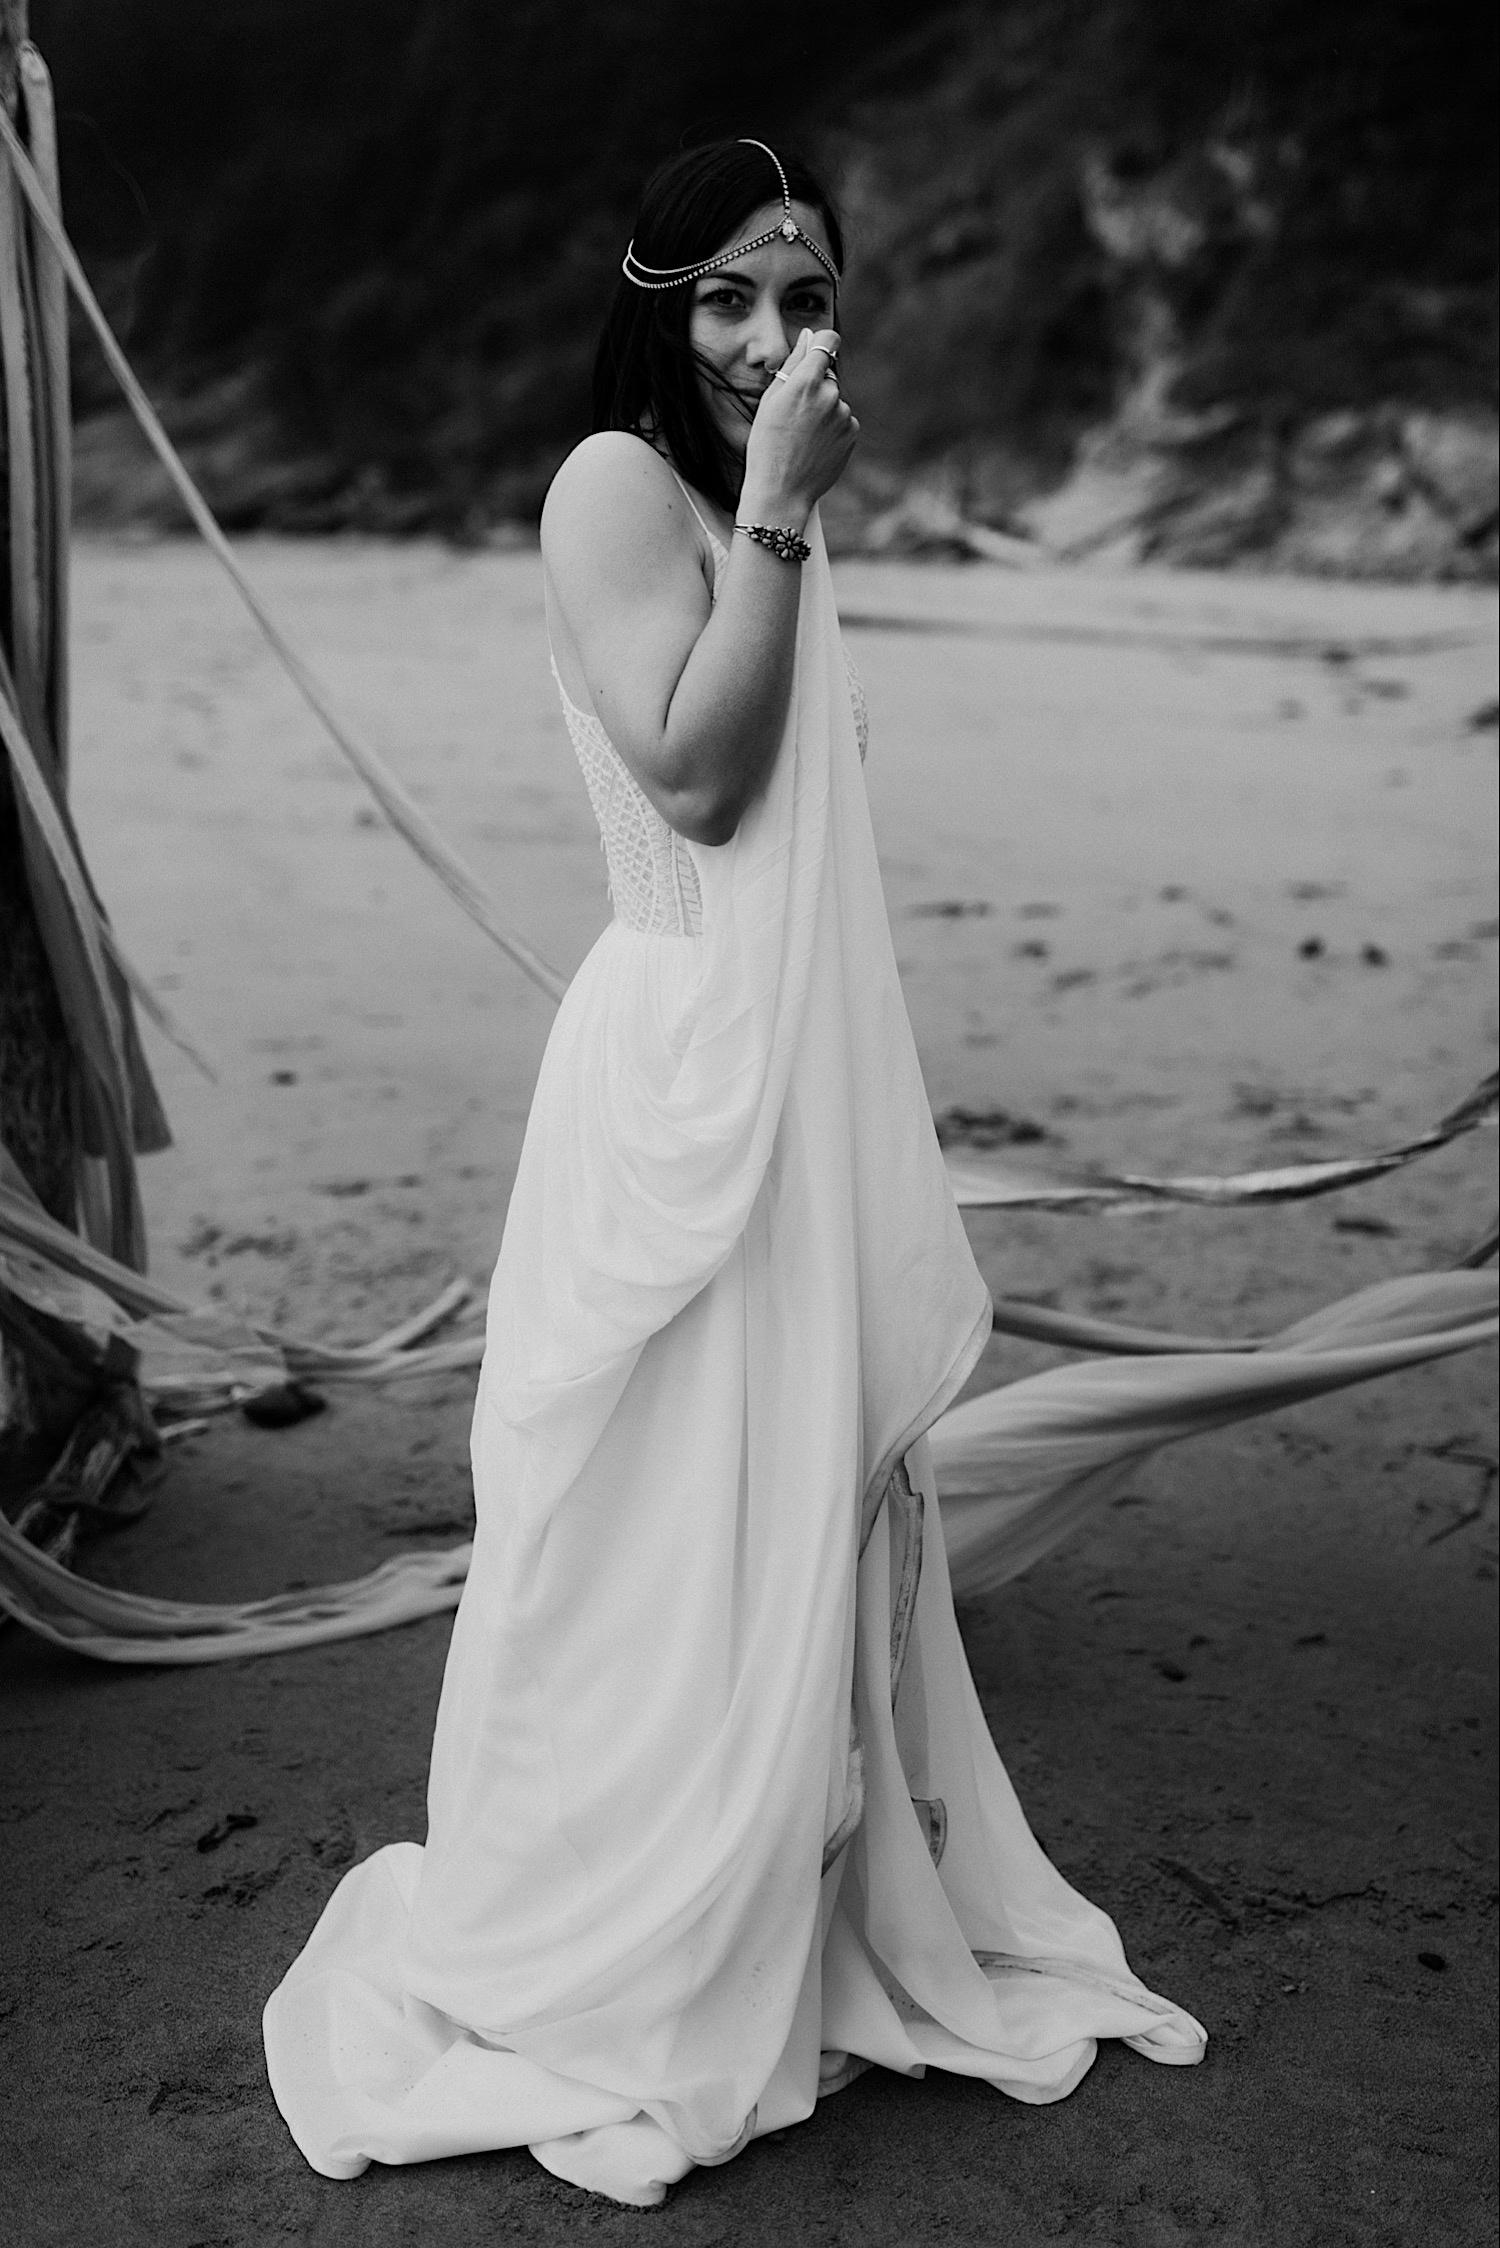 41_cedarandpines-short-sands-250_Photographer_Megan_Adventure_kantor_Wedding.jpg